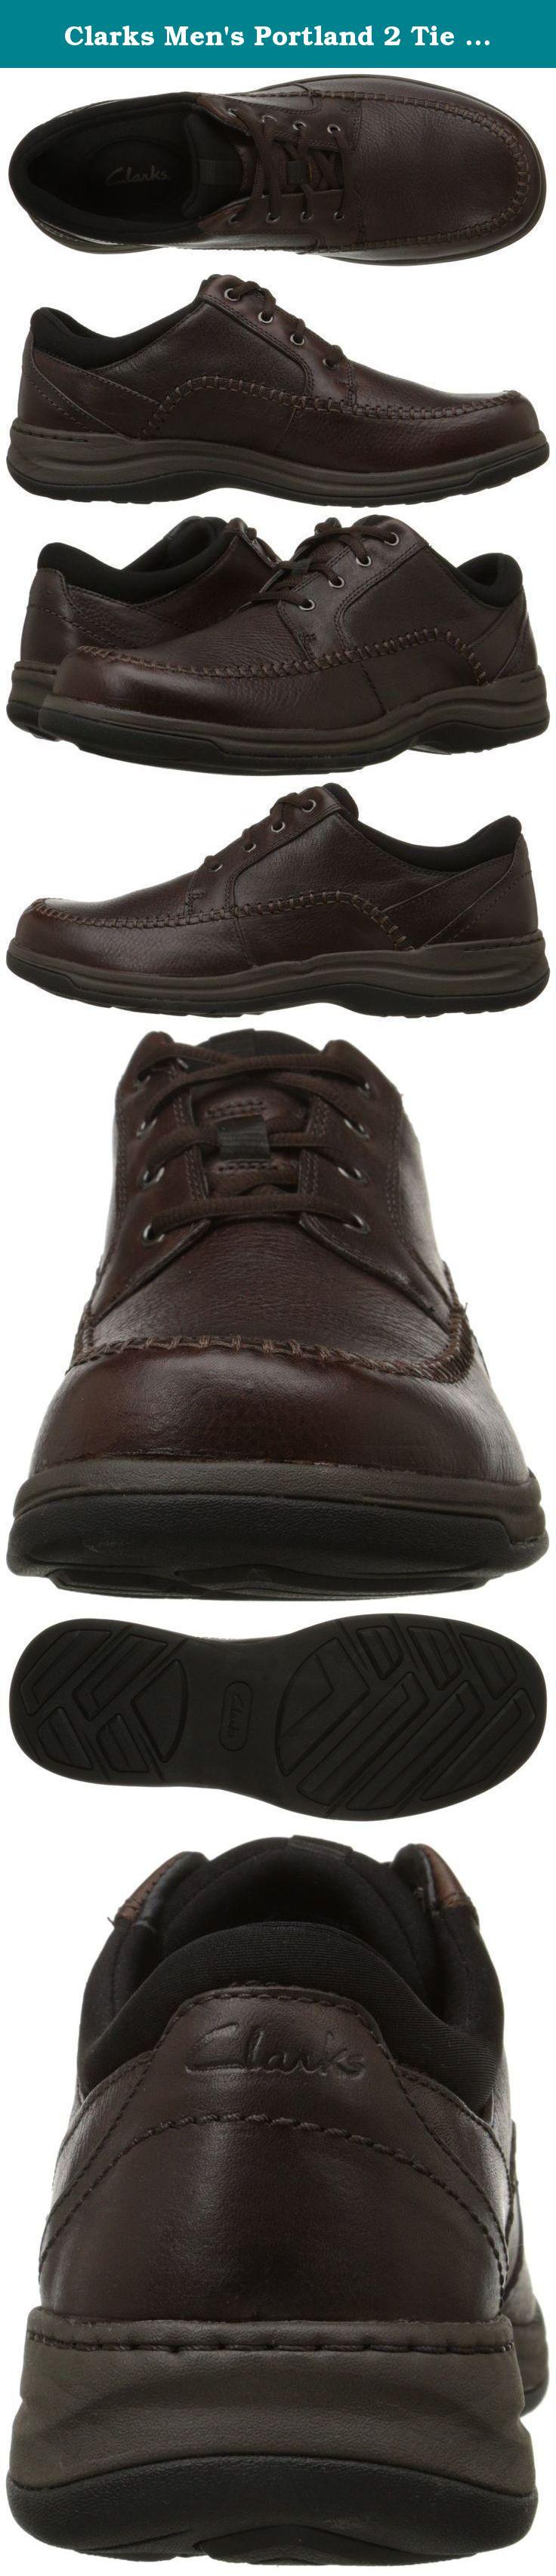 e0ef6e90 Clarks Men's Portland 2 Tie Casual Shoe. Men would love the Clarks ...